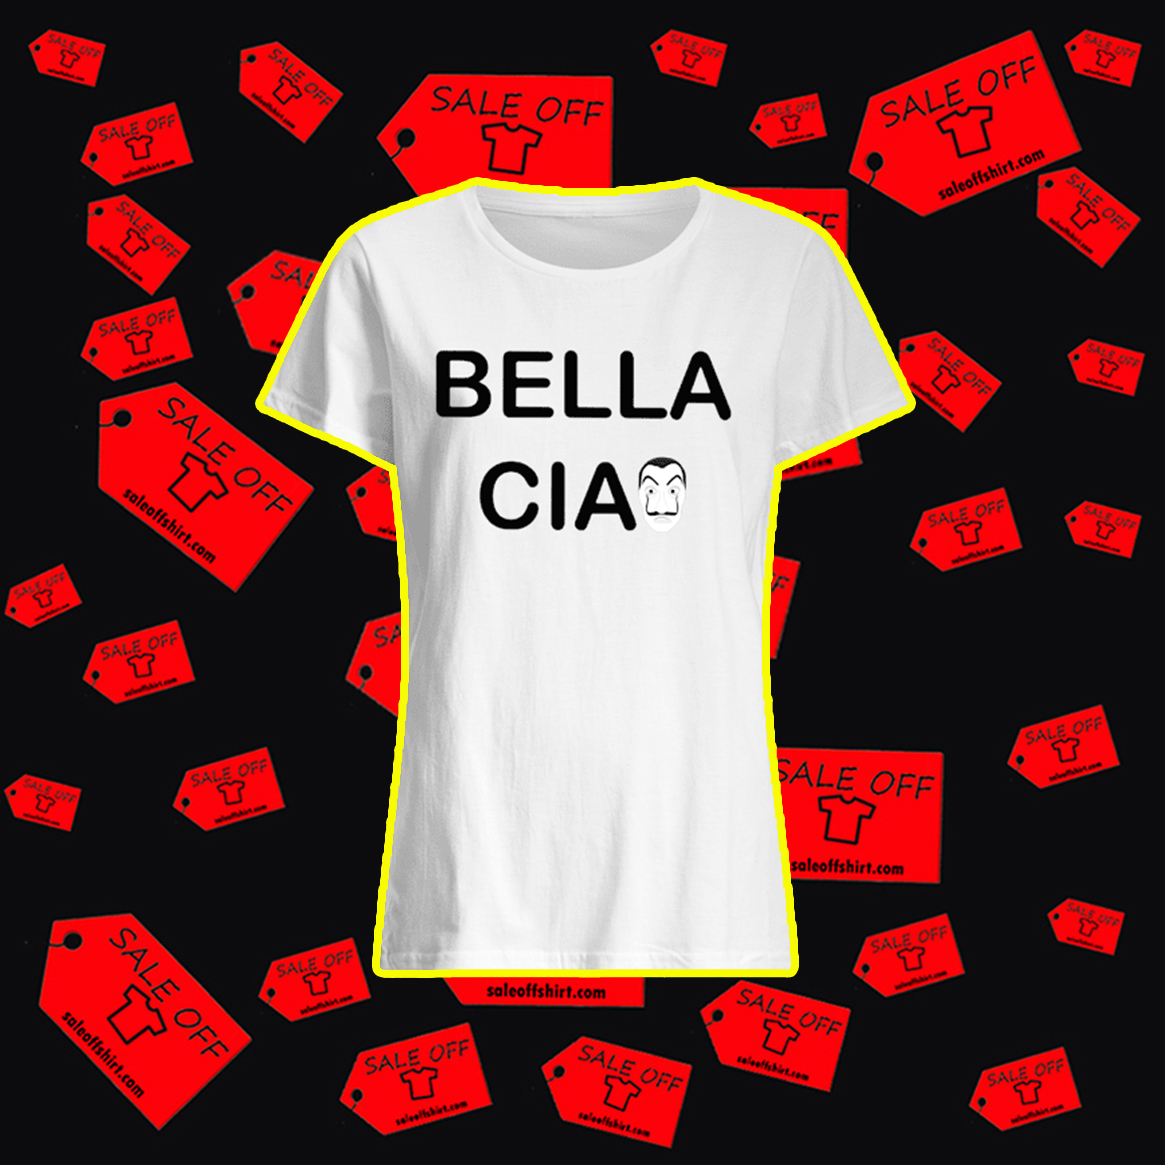 Bella Ciao shirt